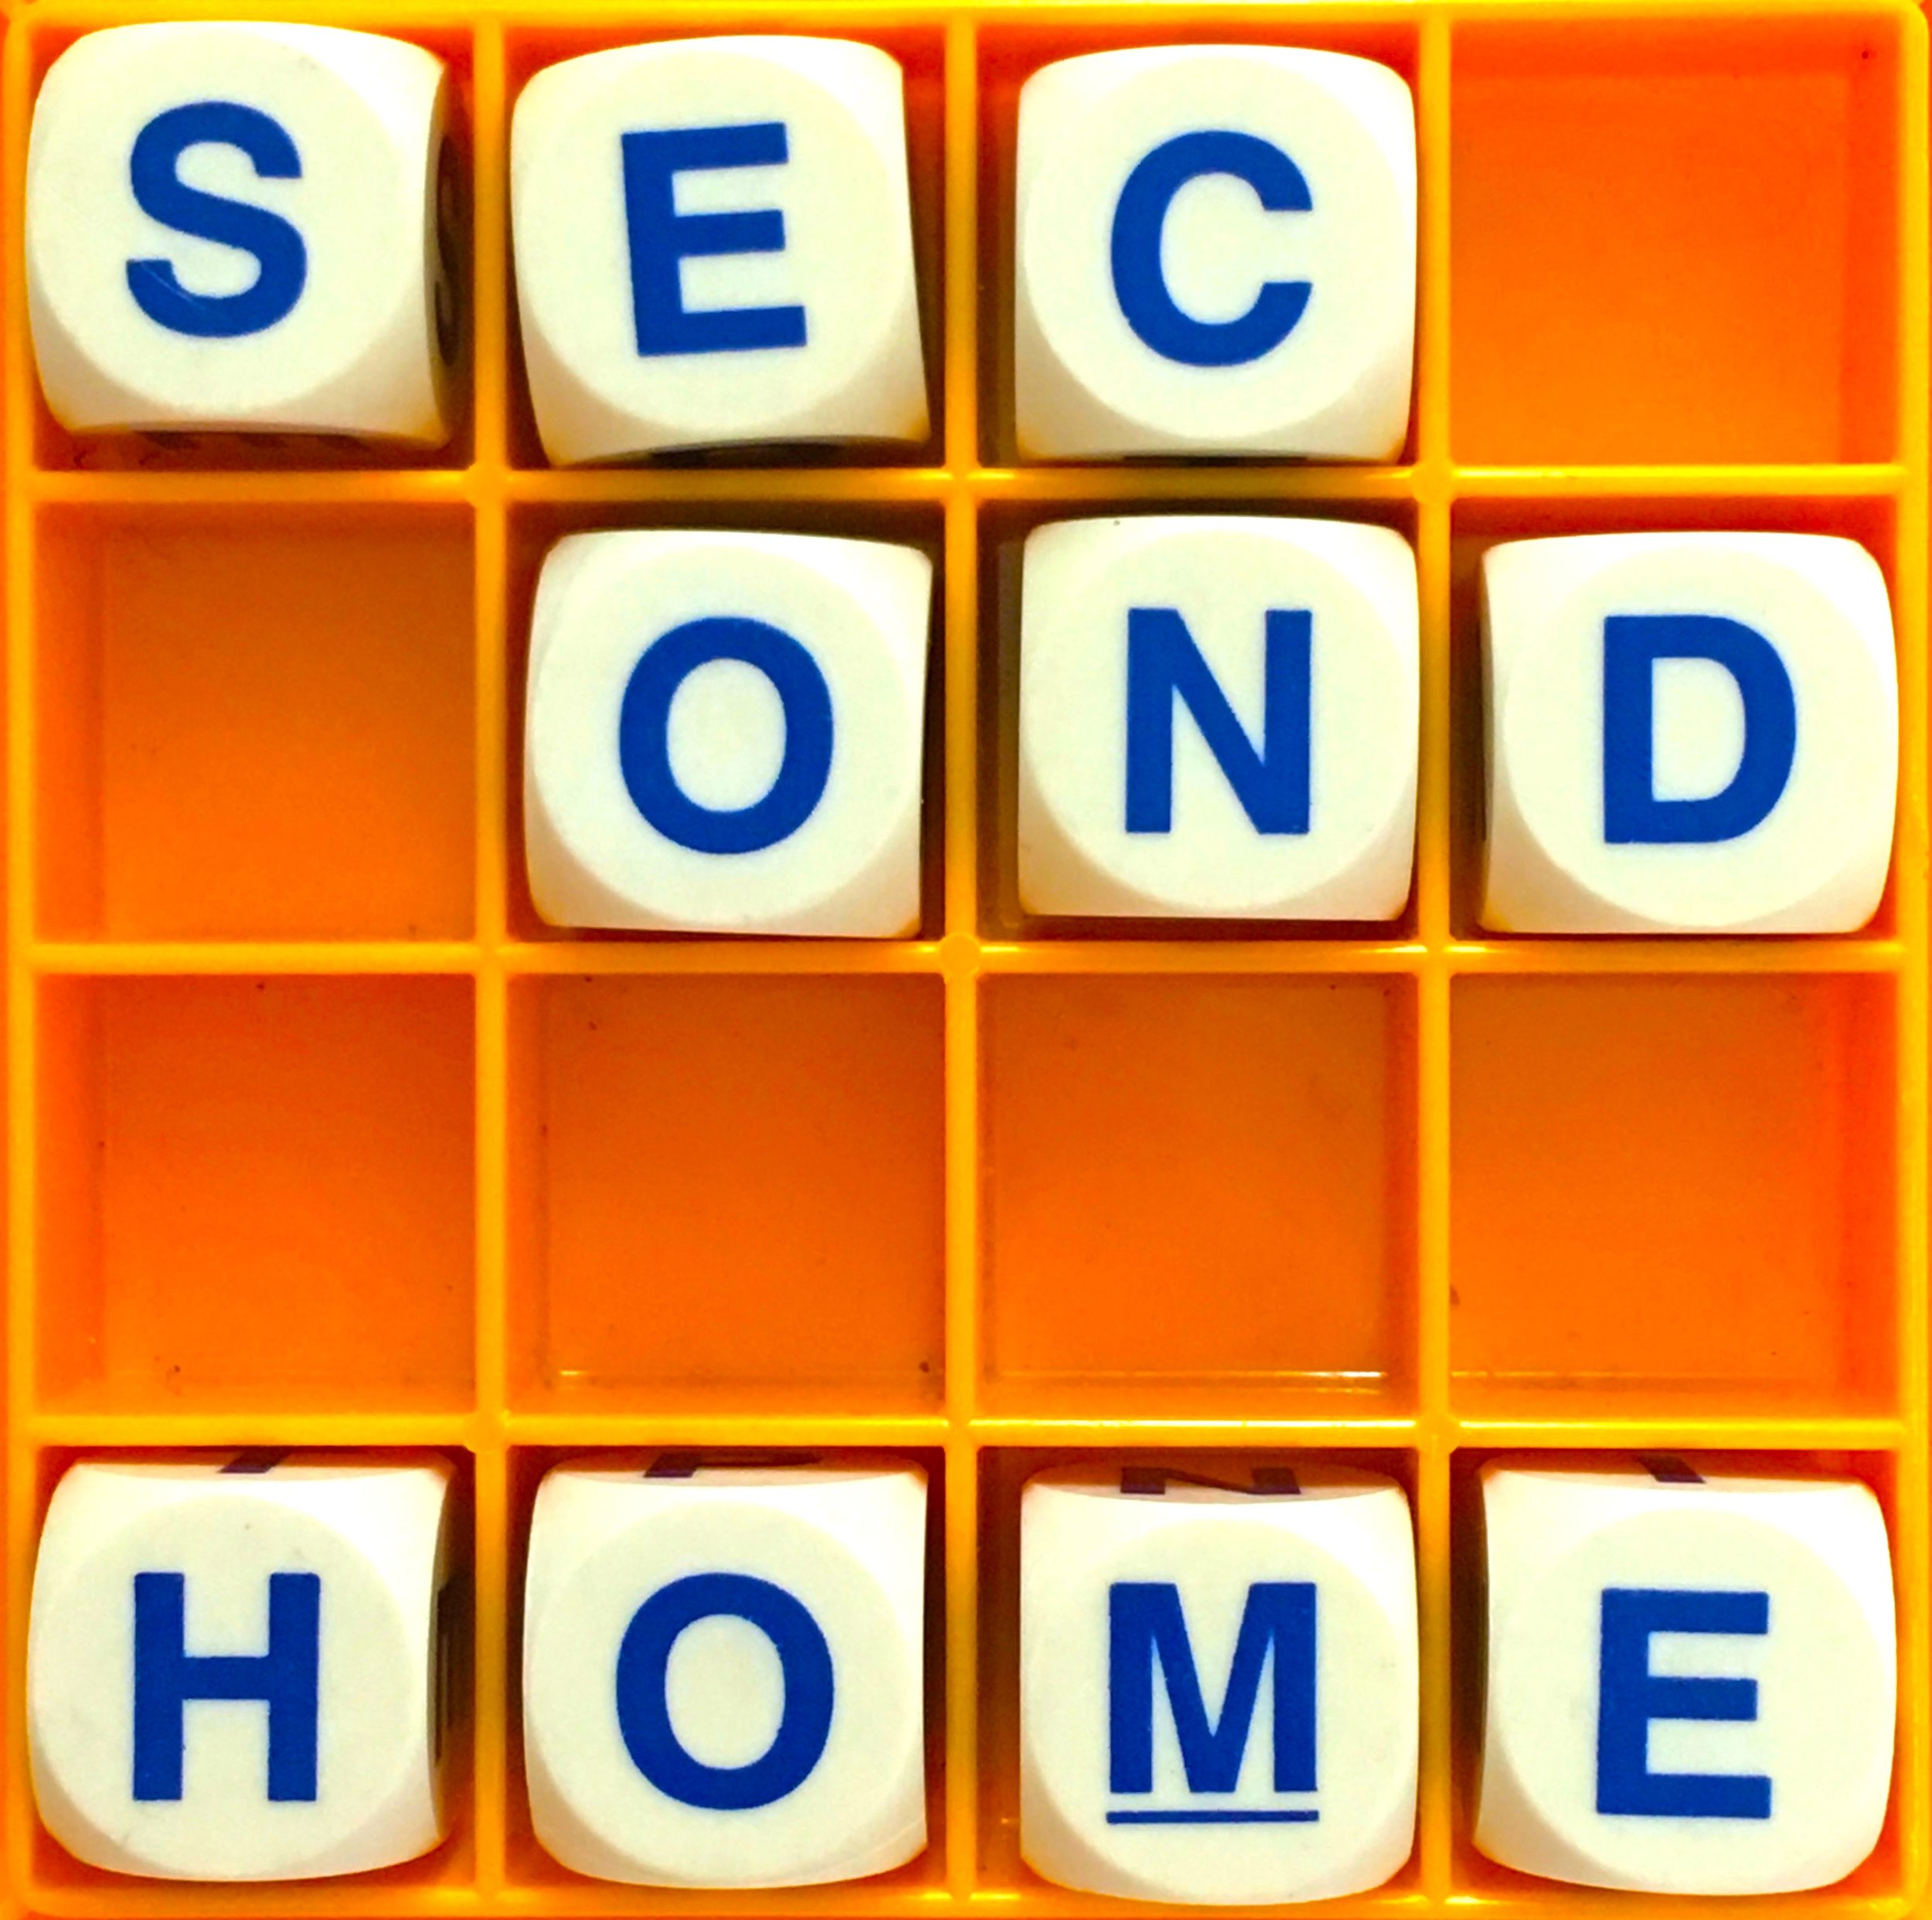 A77 Second Home logo.jpg